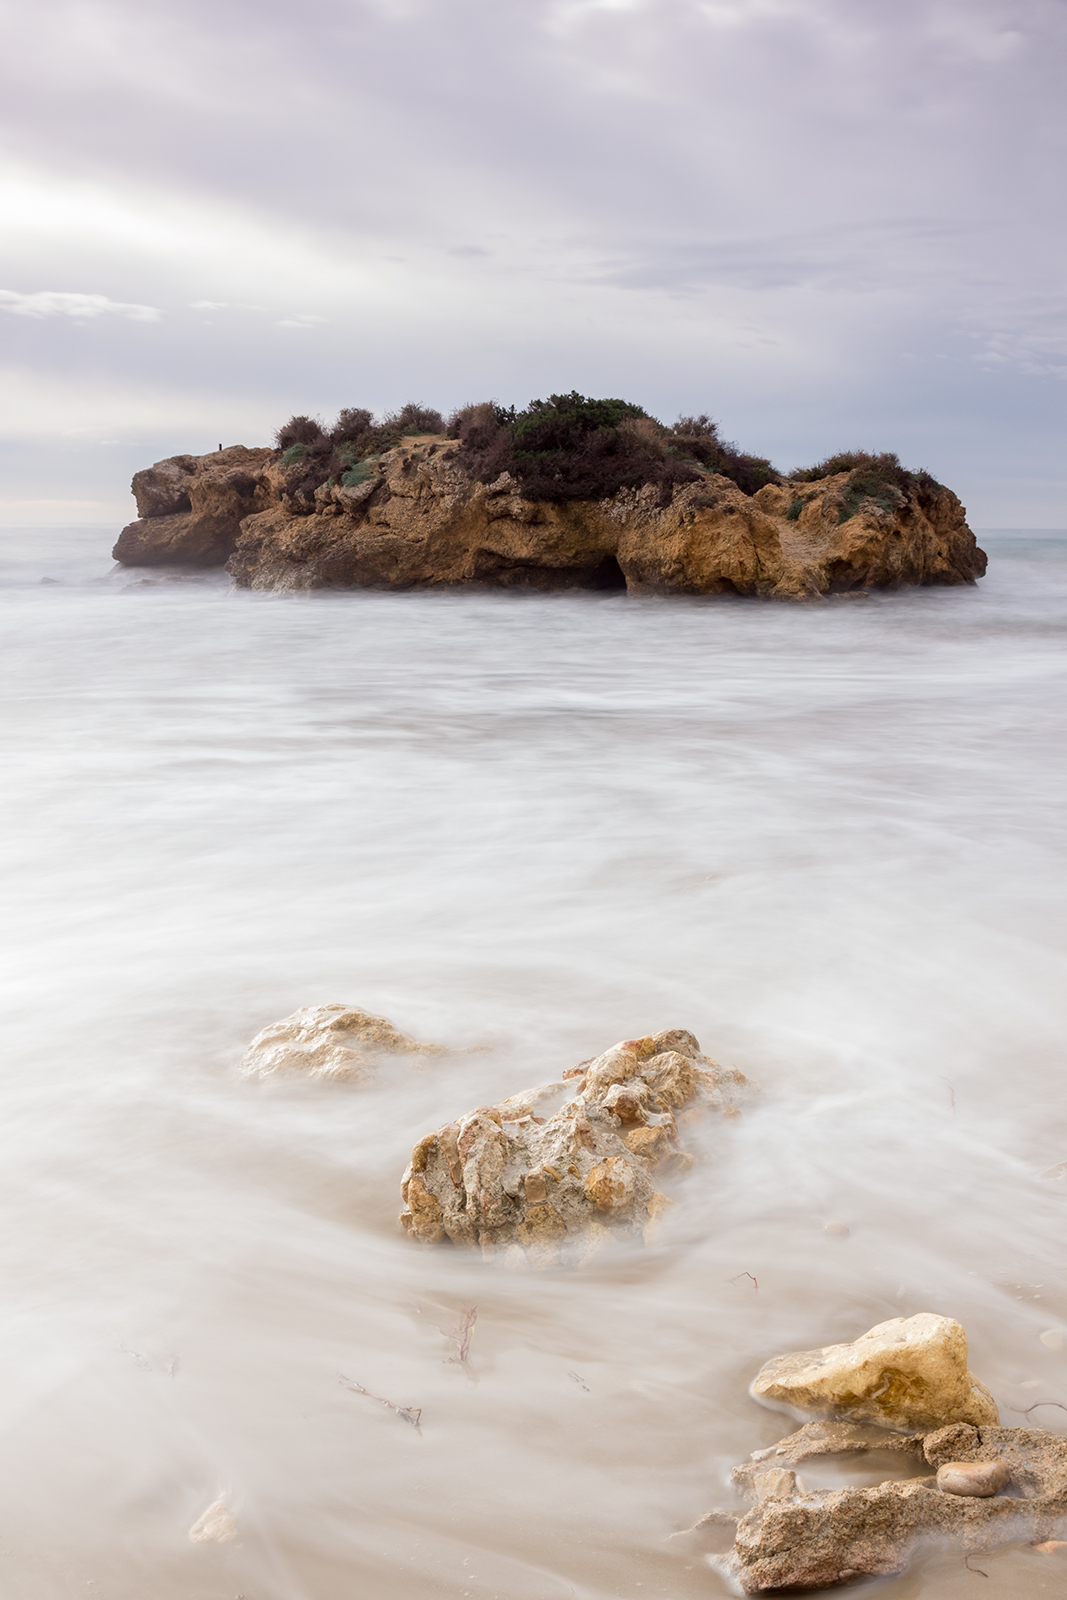 Paisaje costa de Tarragona, Tamarit, roca en el mar con oleaje,Danilatorre,danilatorre, Dani Latorre, daniel Latorre